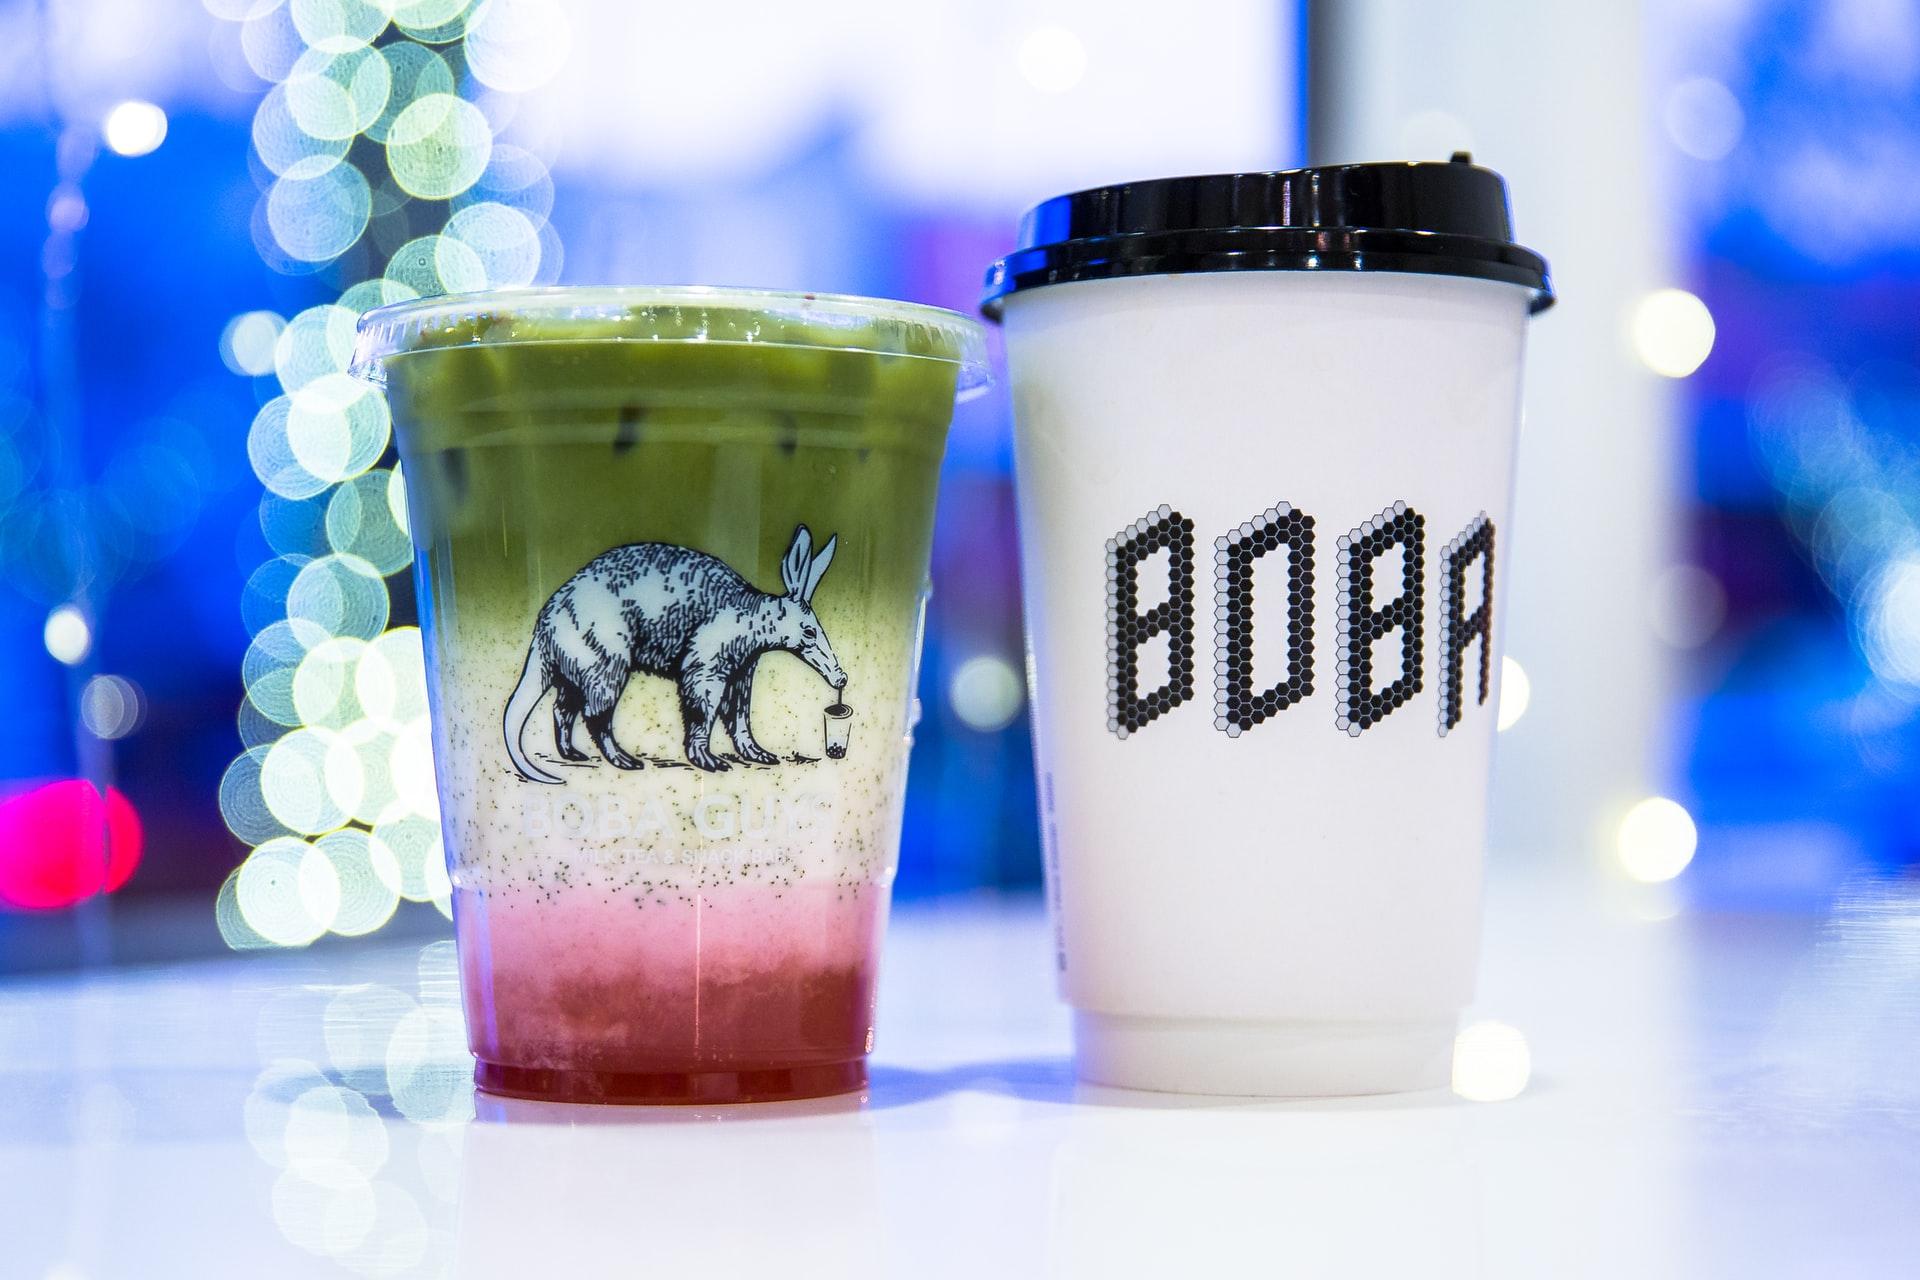 boba, bubble tea facts